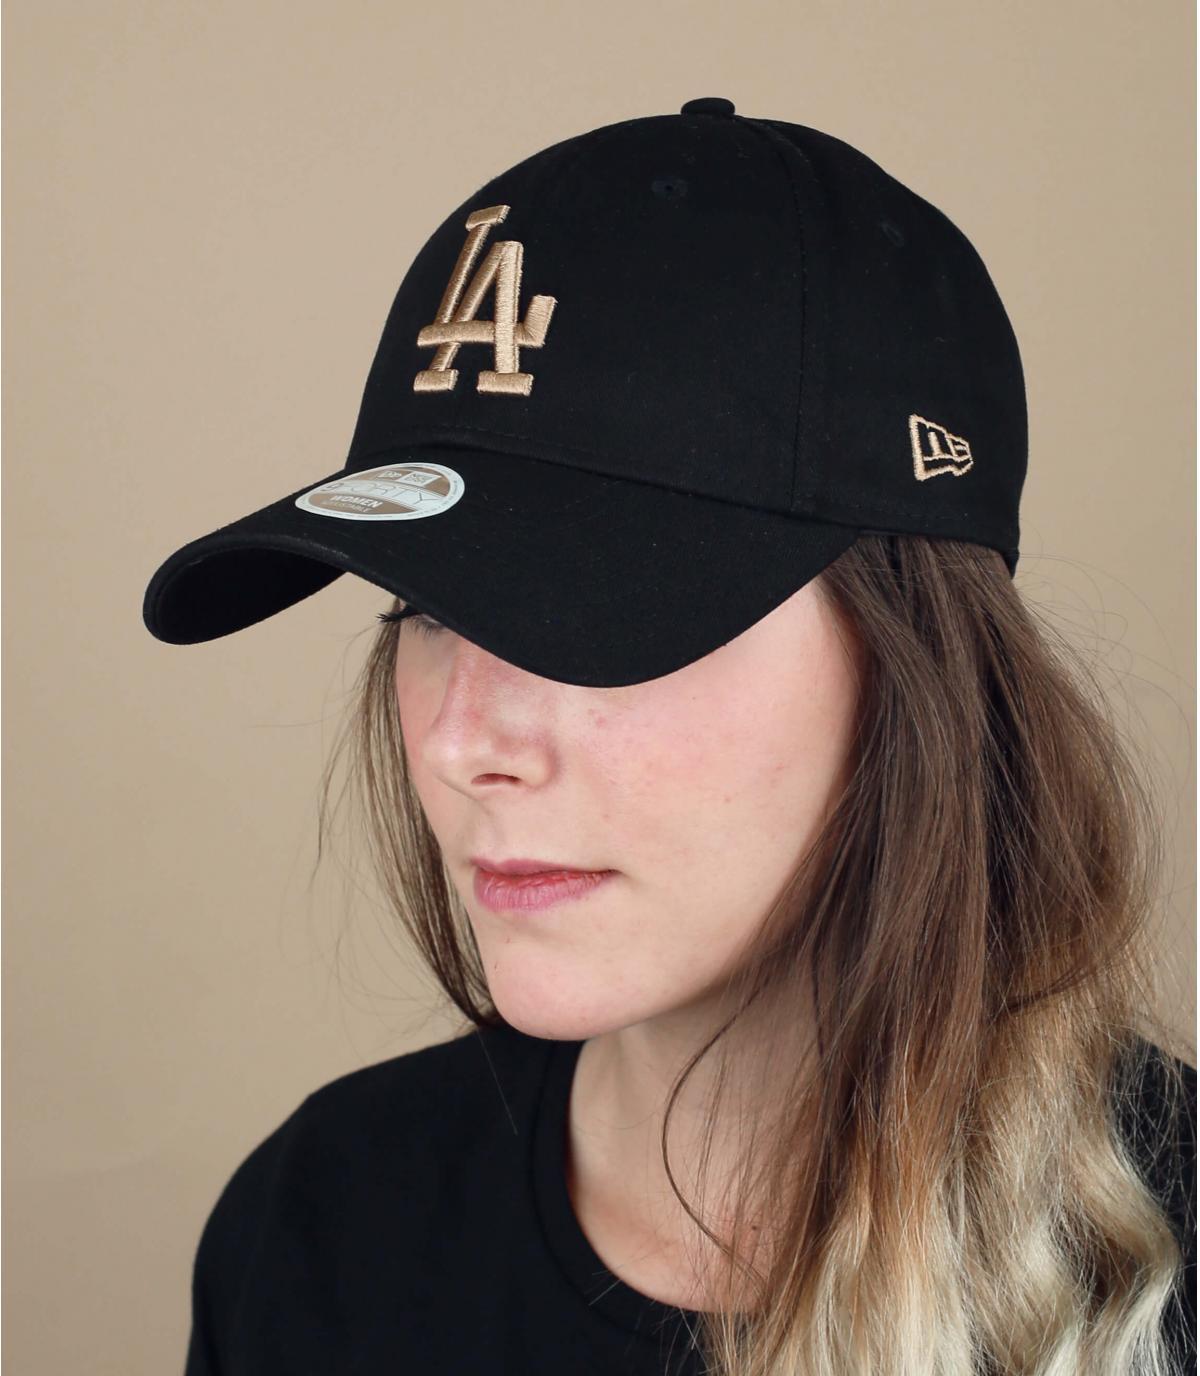 women LA black cap